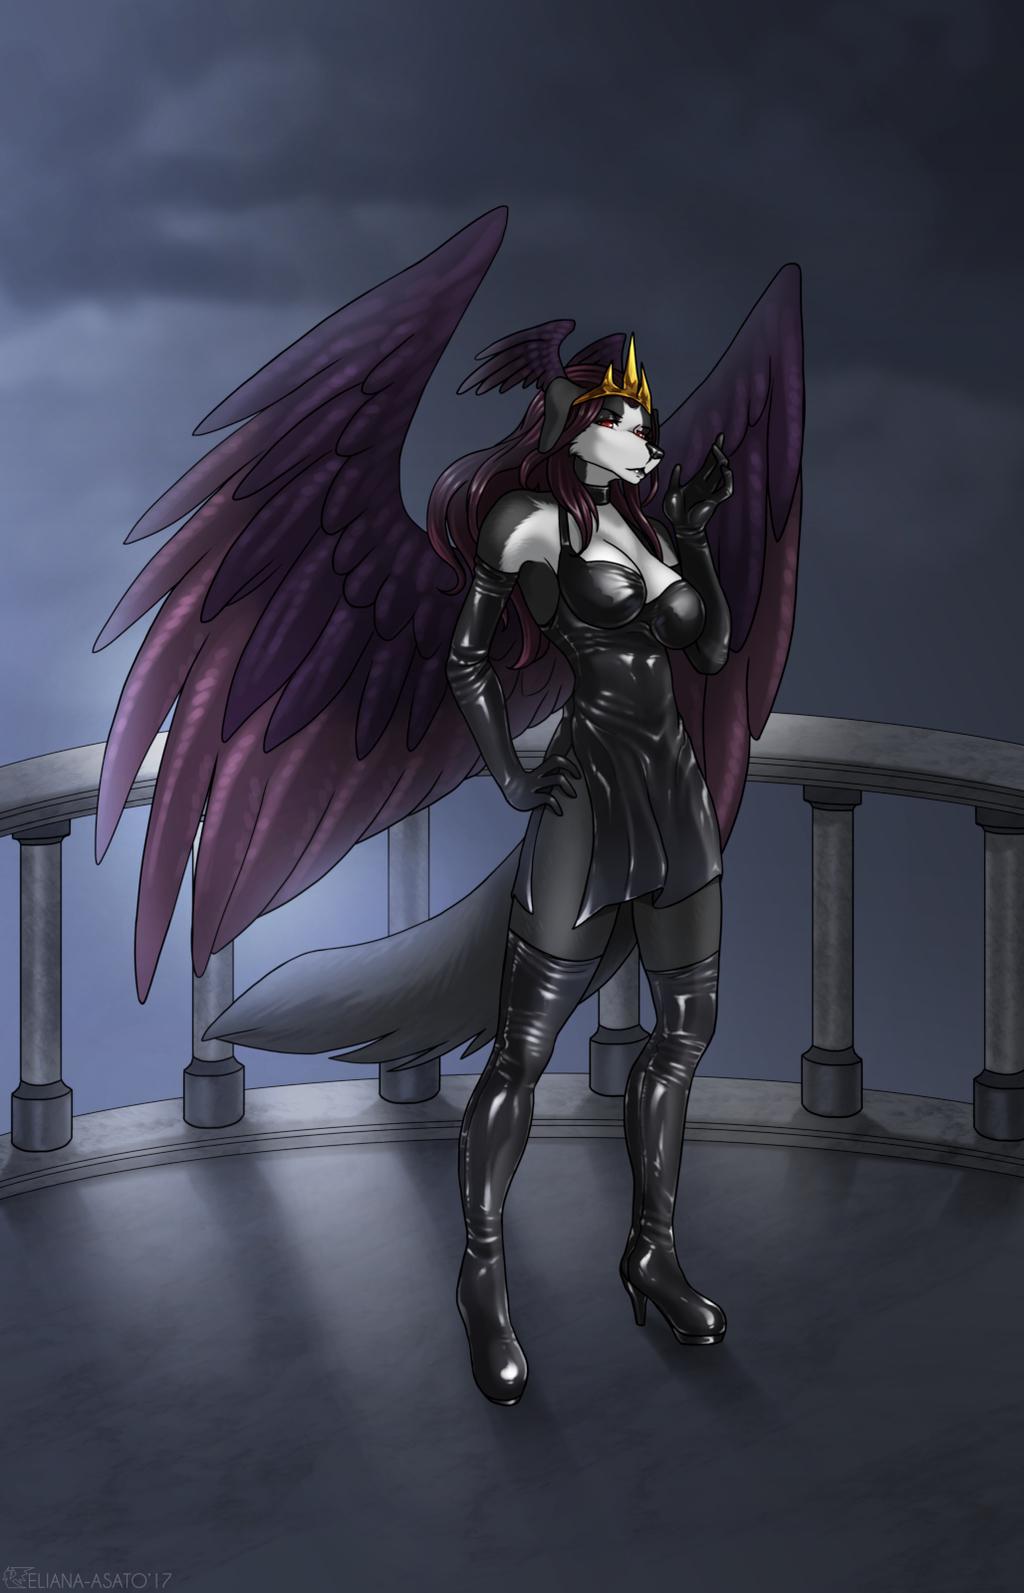 Most recent image: Queen Admaria by Eliana Asato